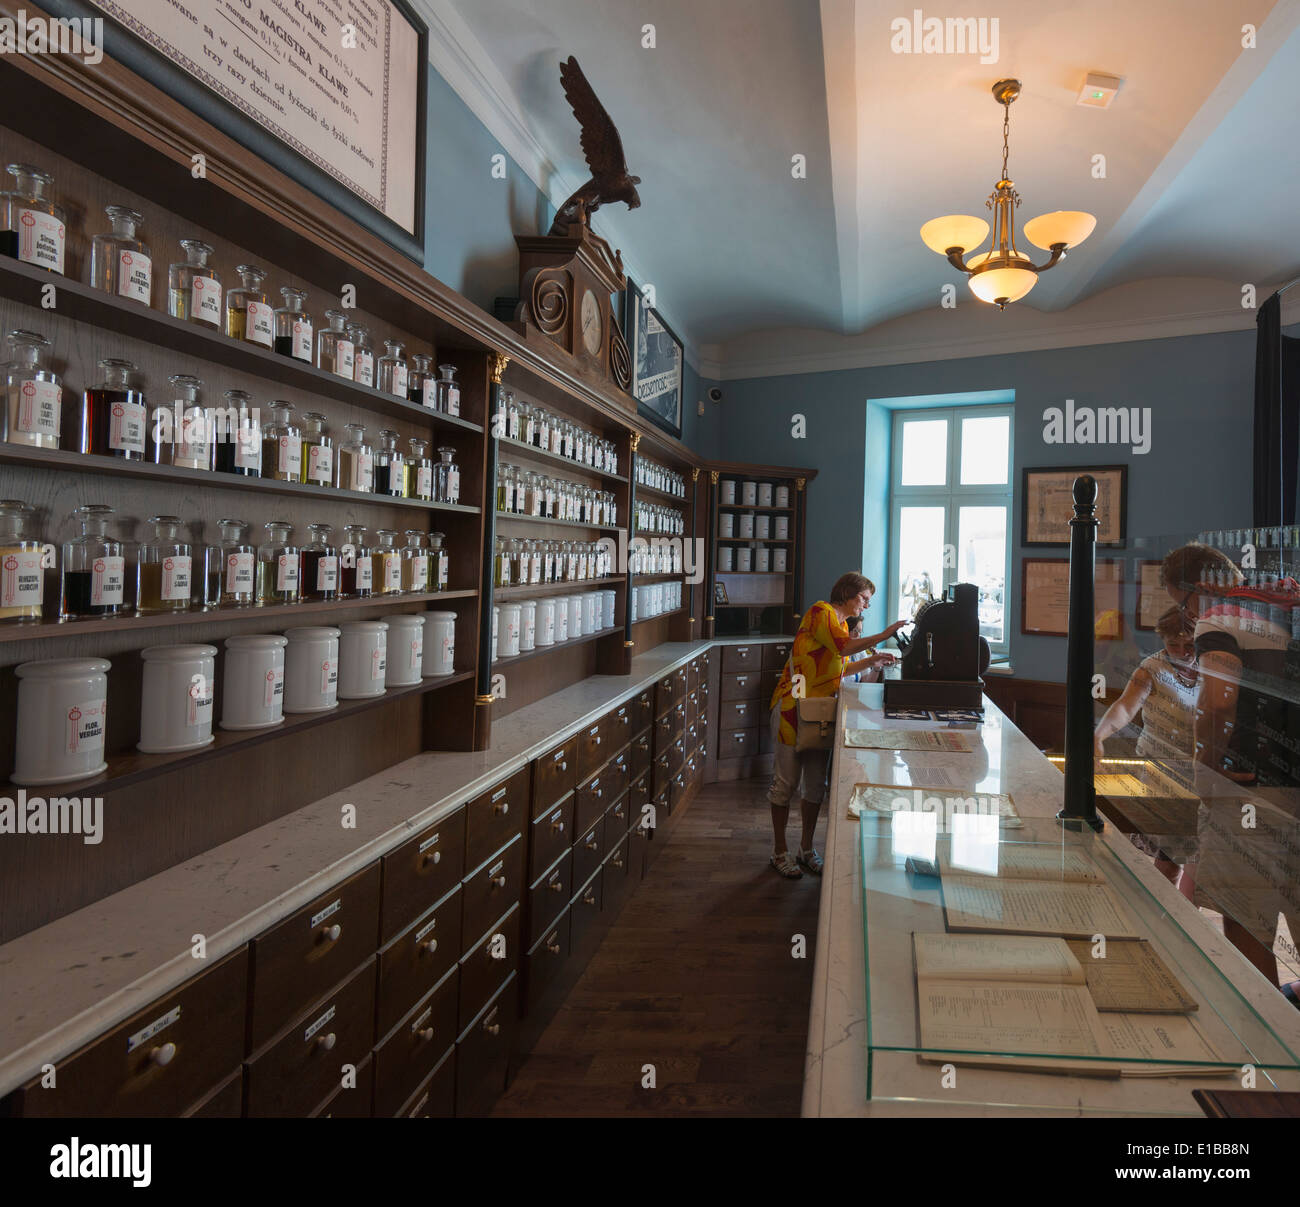 Europe, Poland, Malopolska, Krakow, Pharmacy Under the Eagle Museum, Unesco site - Stock Image